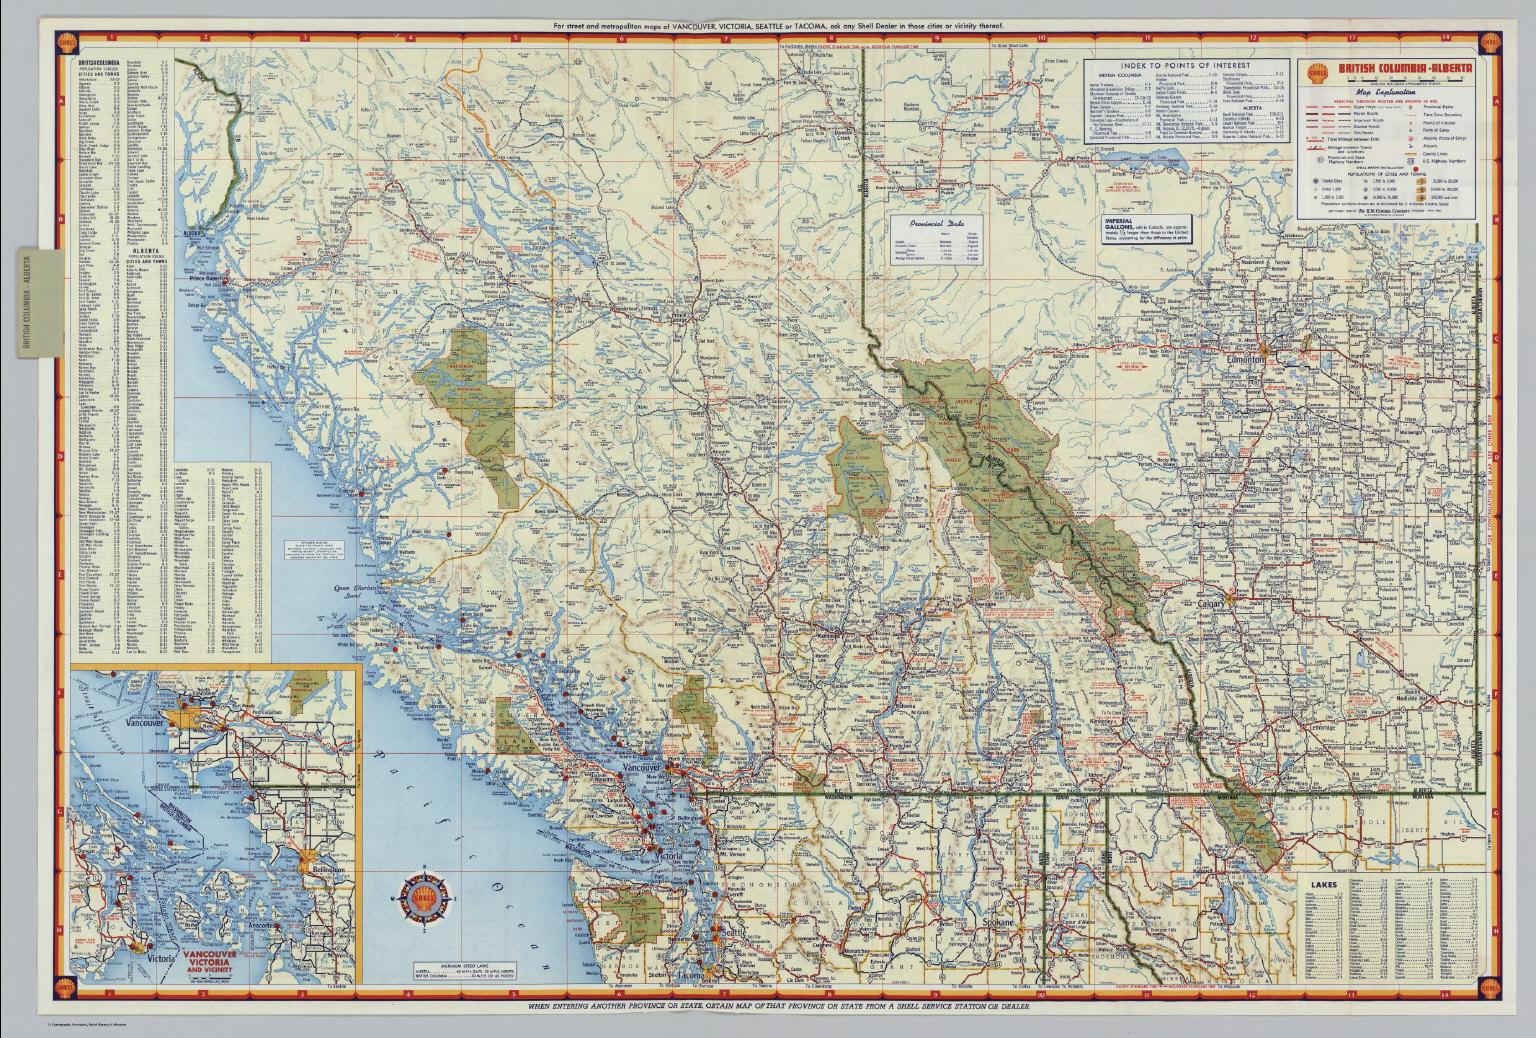 Shell British Columbia Alberta David Rumsey Historical Map